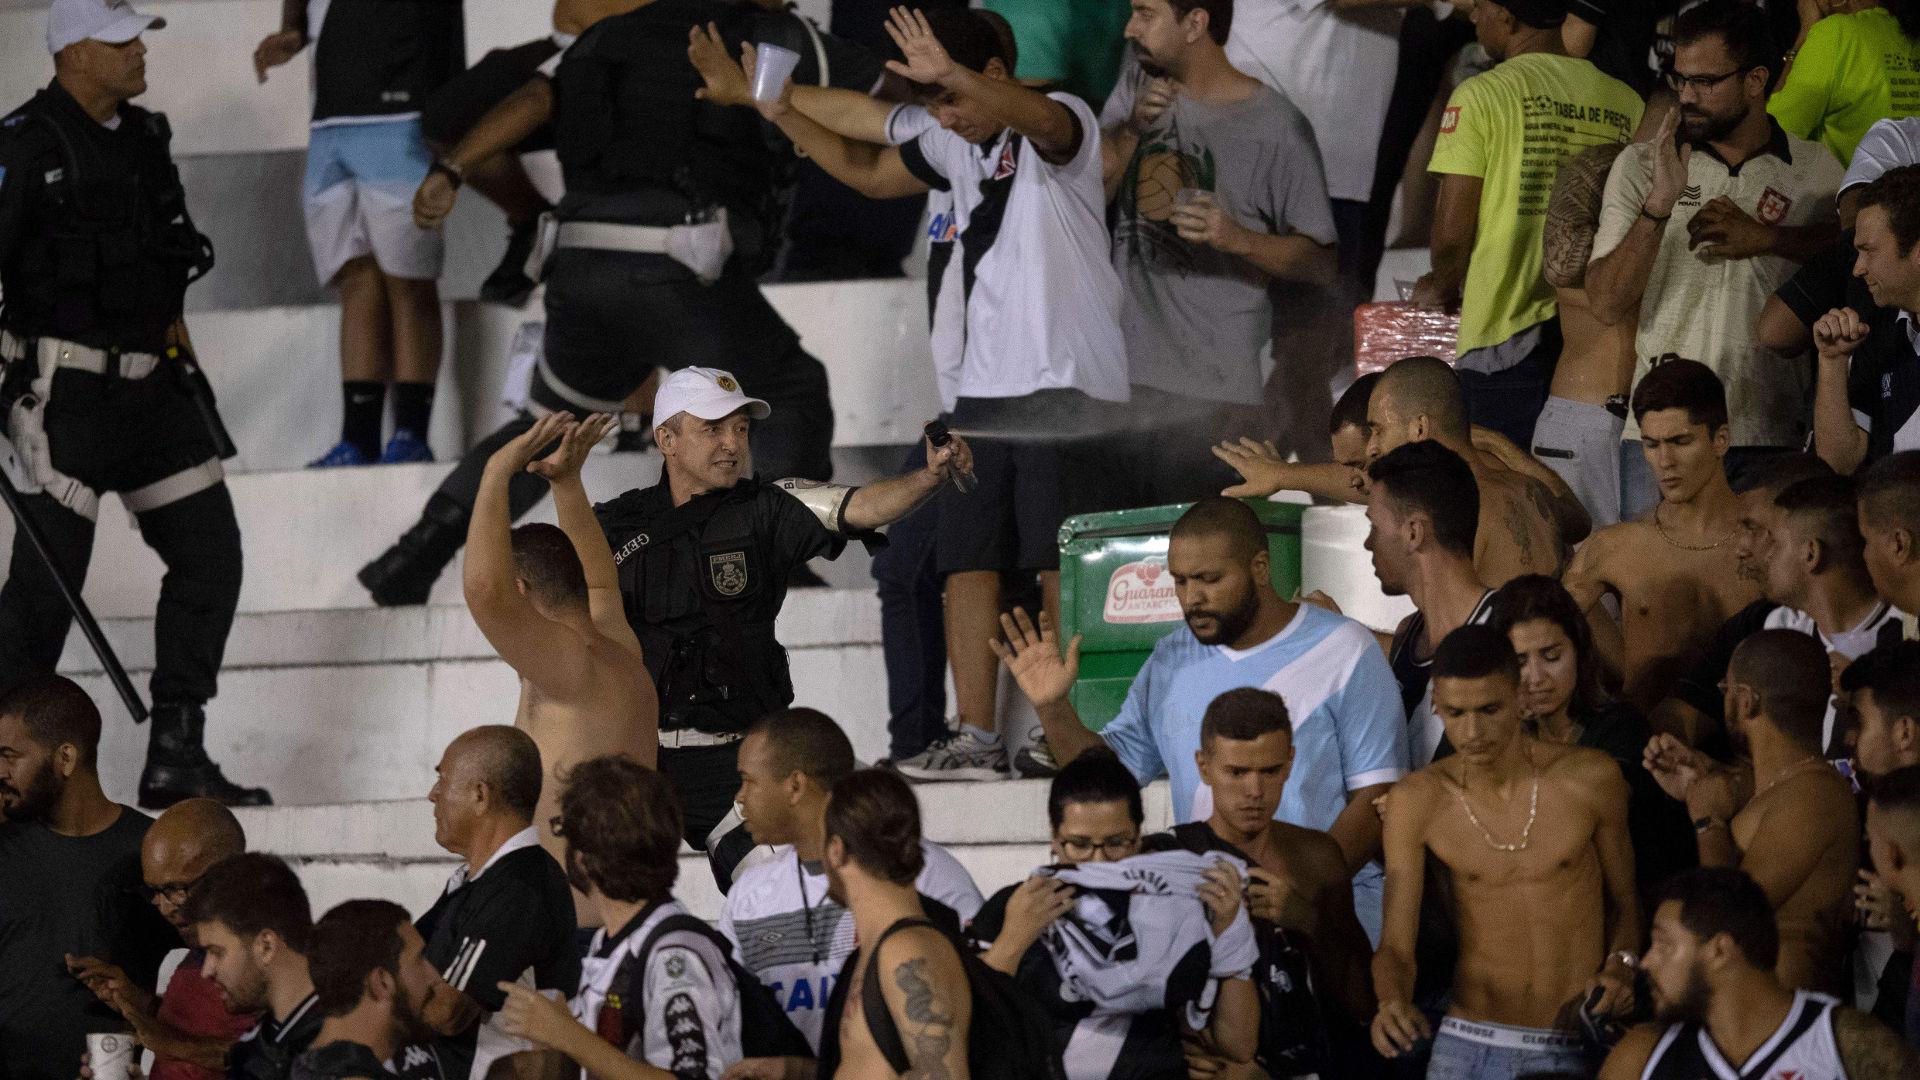 Torcida confusao Vasco Cruzeiro Libertadores 02052018